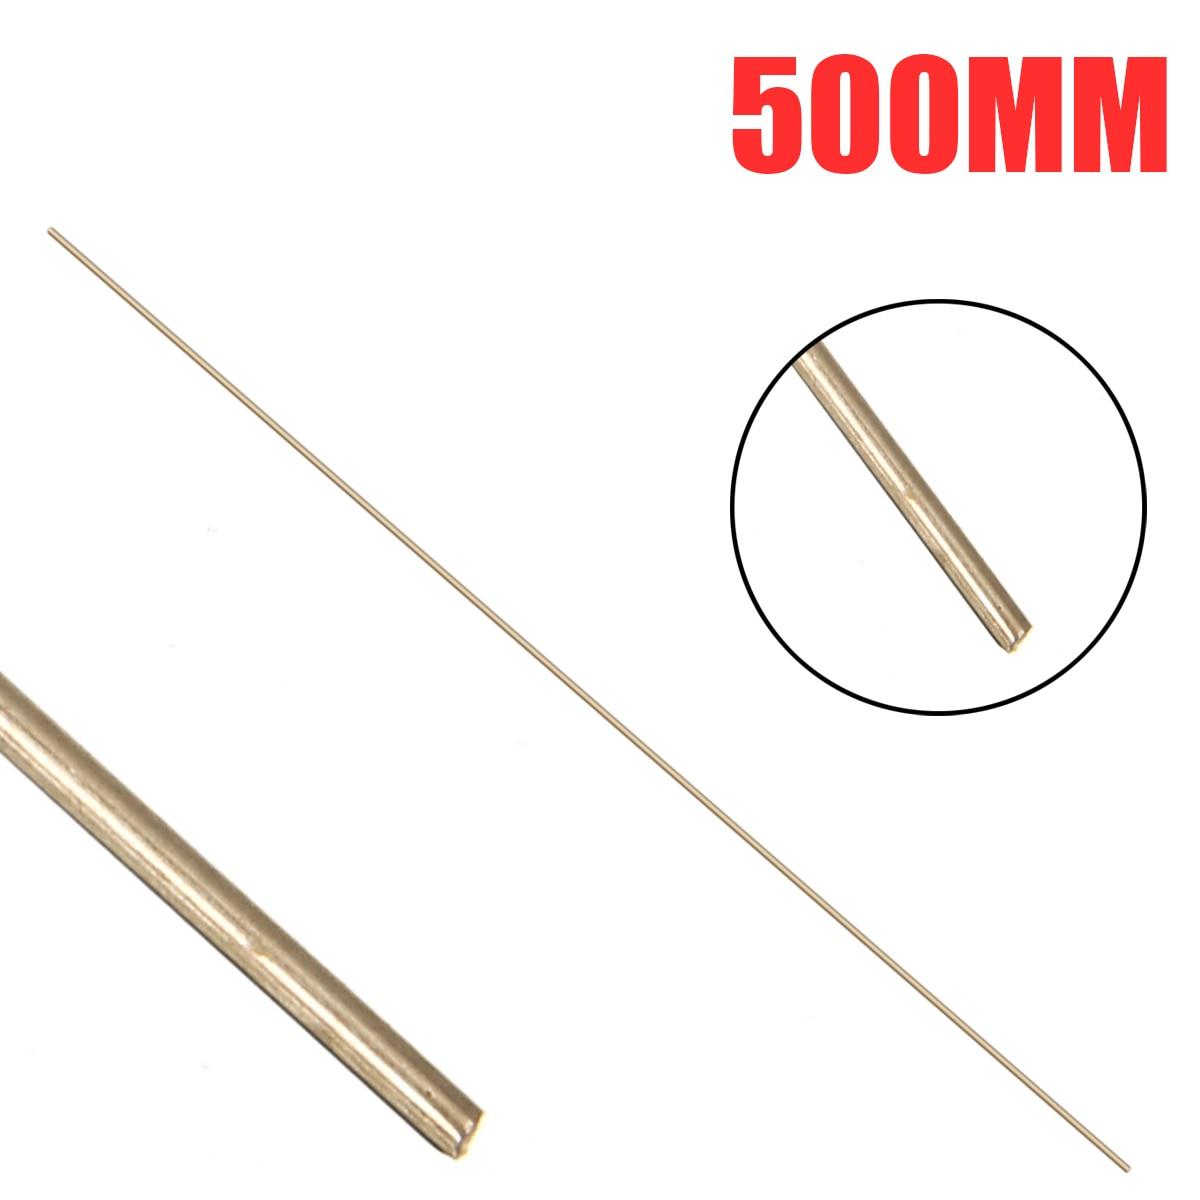 Silver Welding Rod 1.5mm Diameter Solder Rod Silver Solder Rod 56% Welding Rod Silver Based Solder